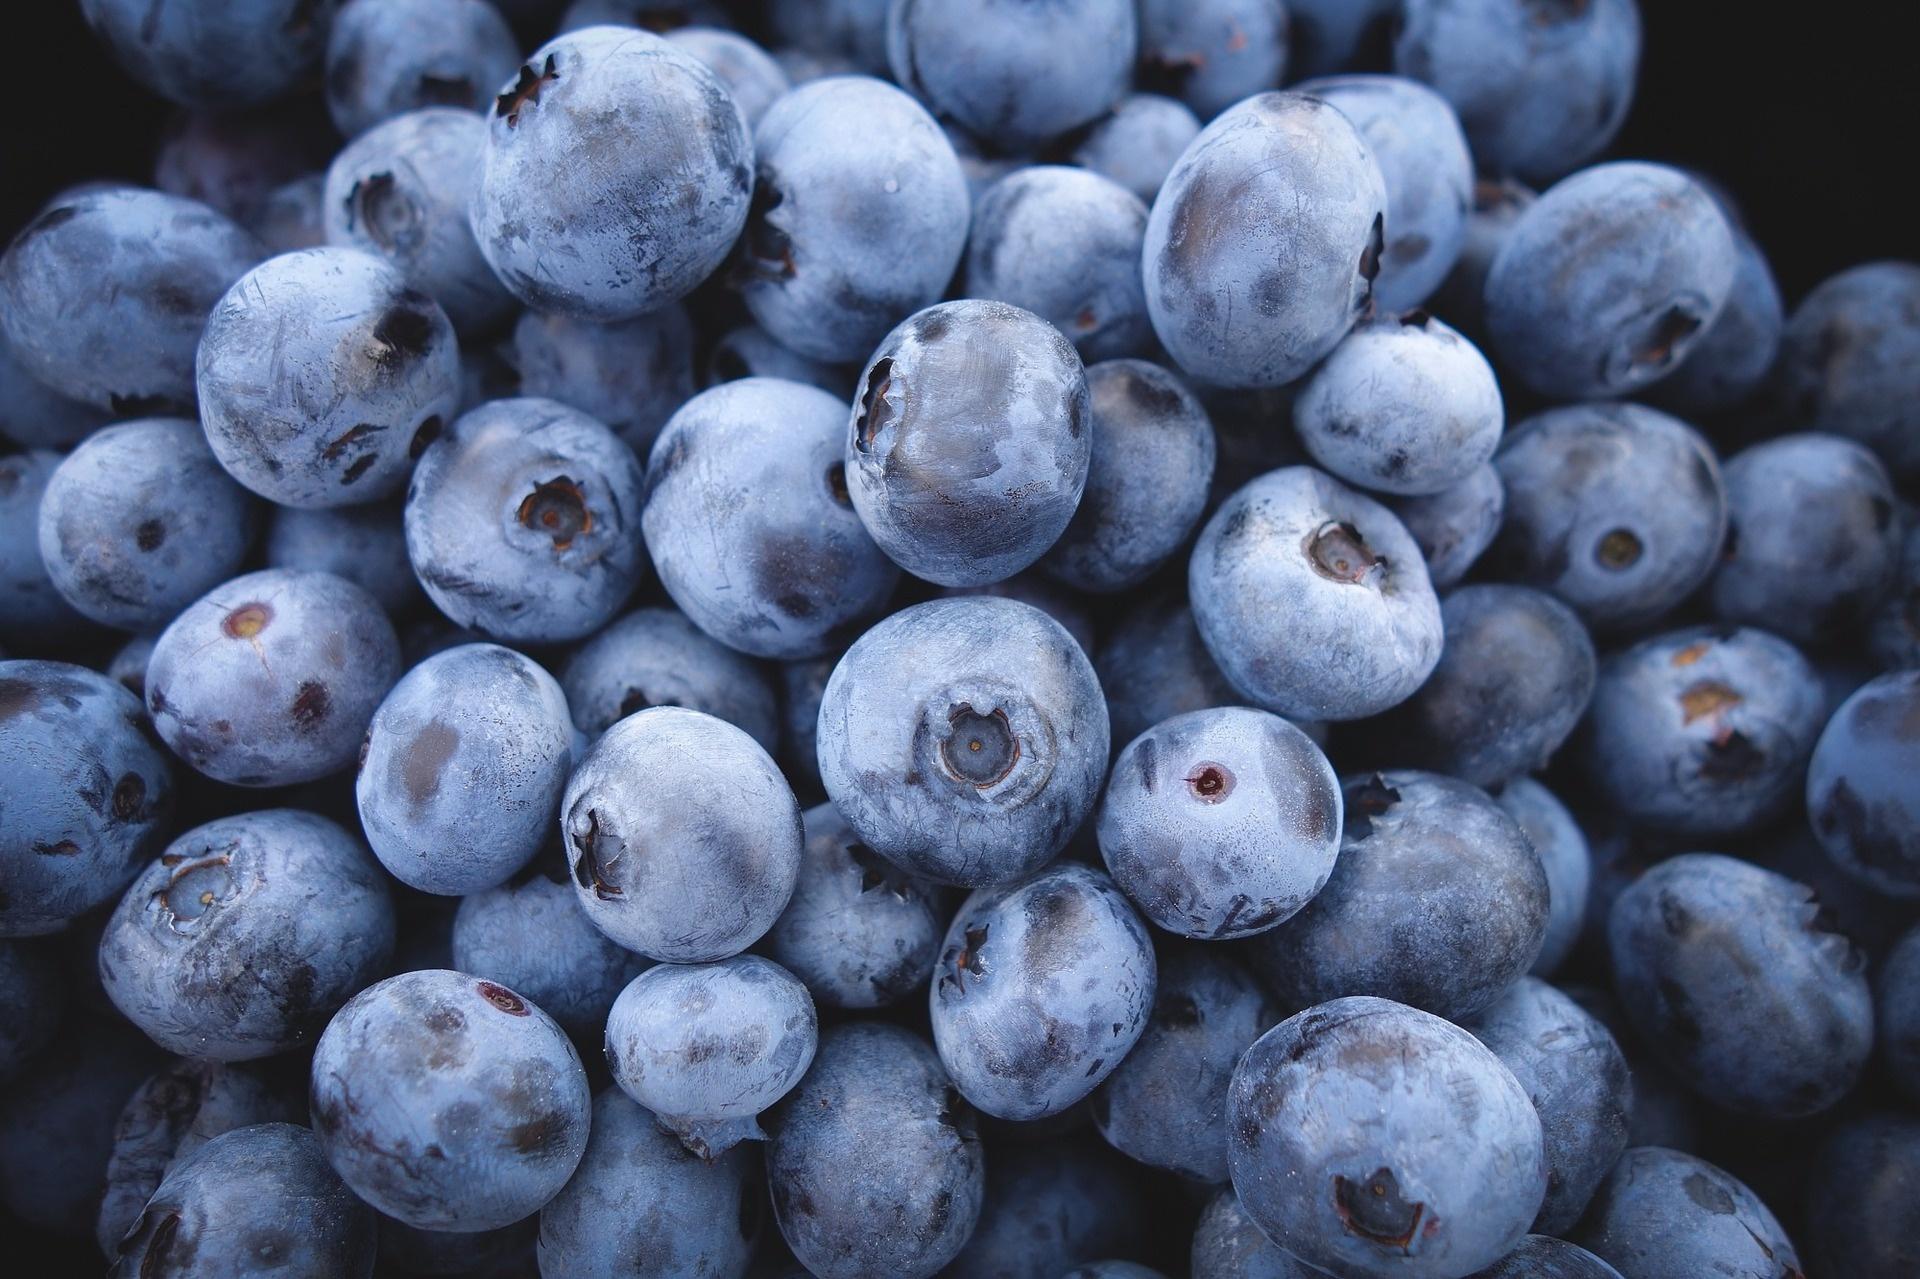 12 Insane Health Benefits of Blueberries